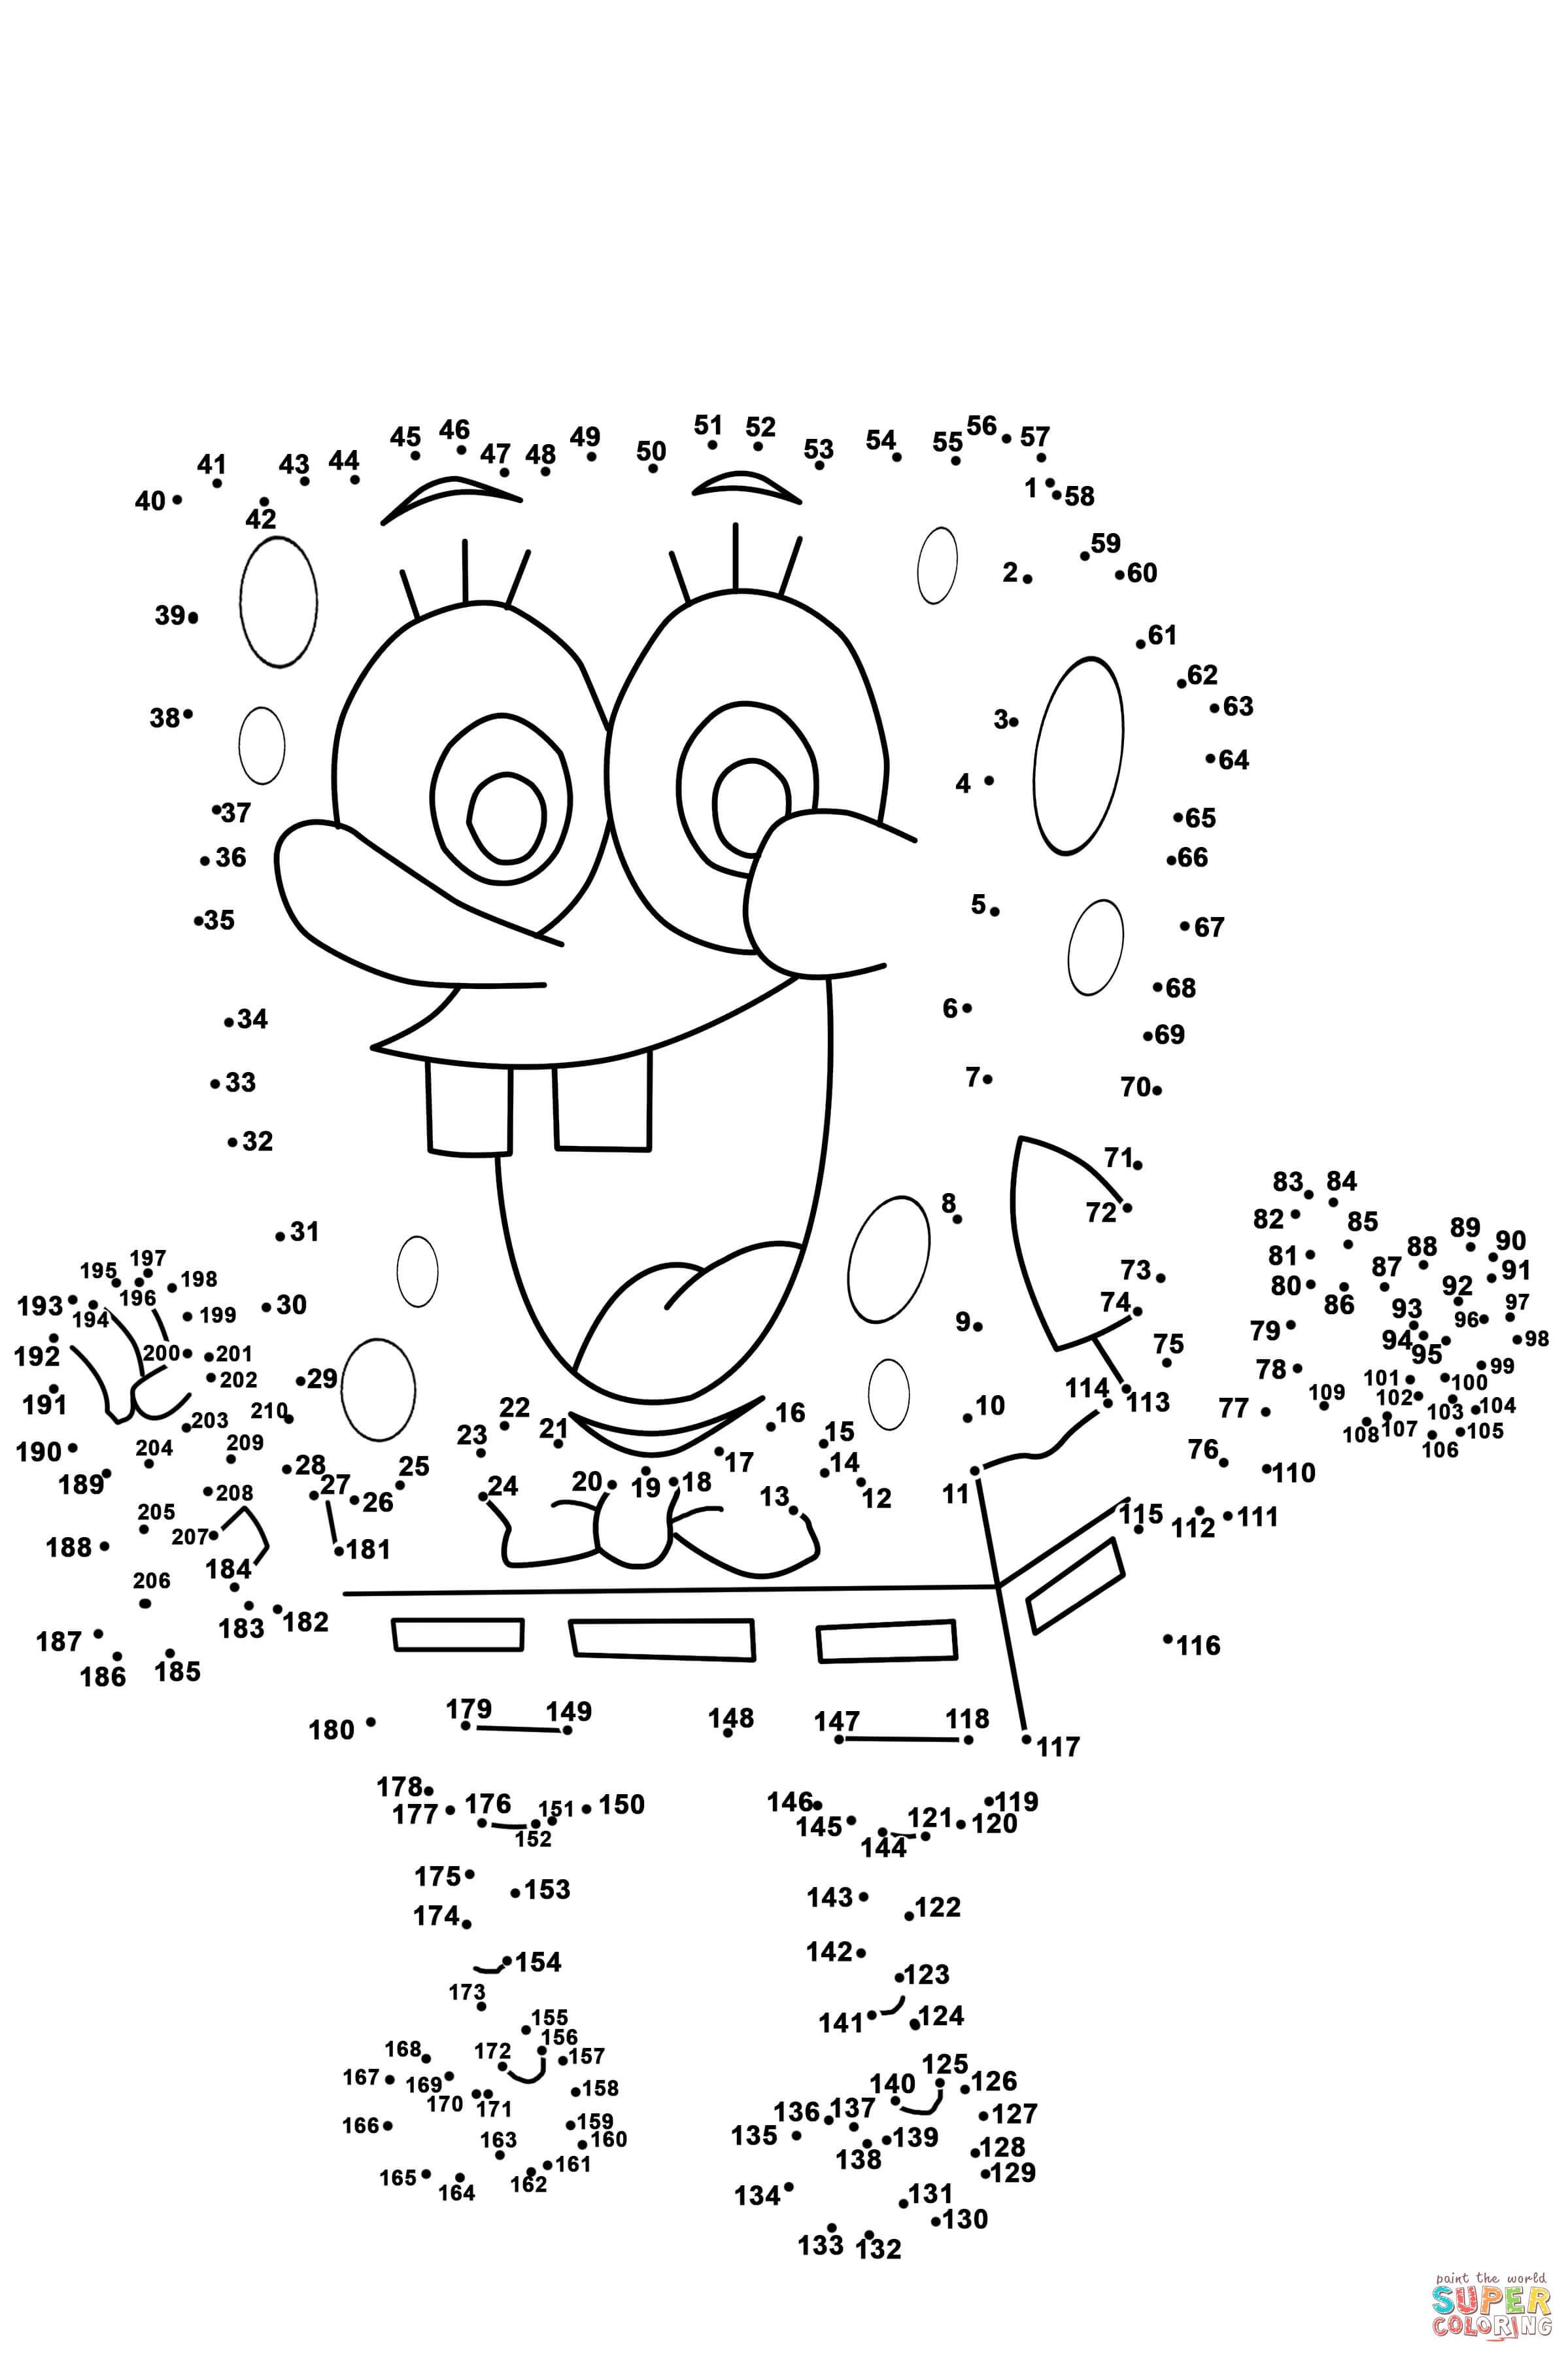 Spongebob Dot To Dot | Free Printable Coloring Pages - Free Dot To Dot Printables